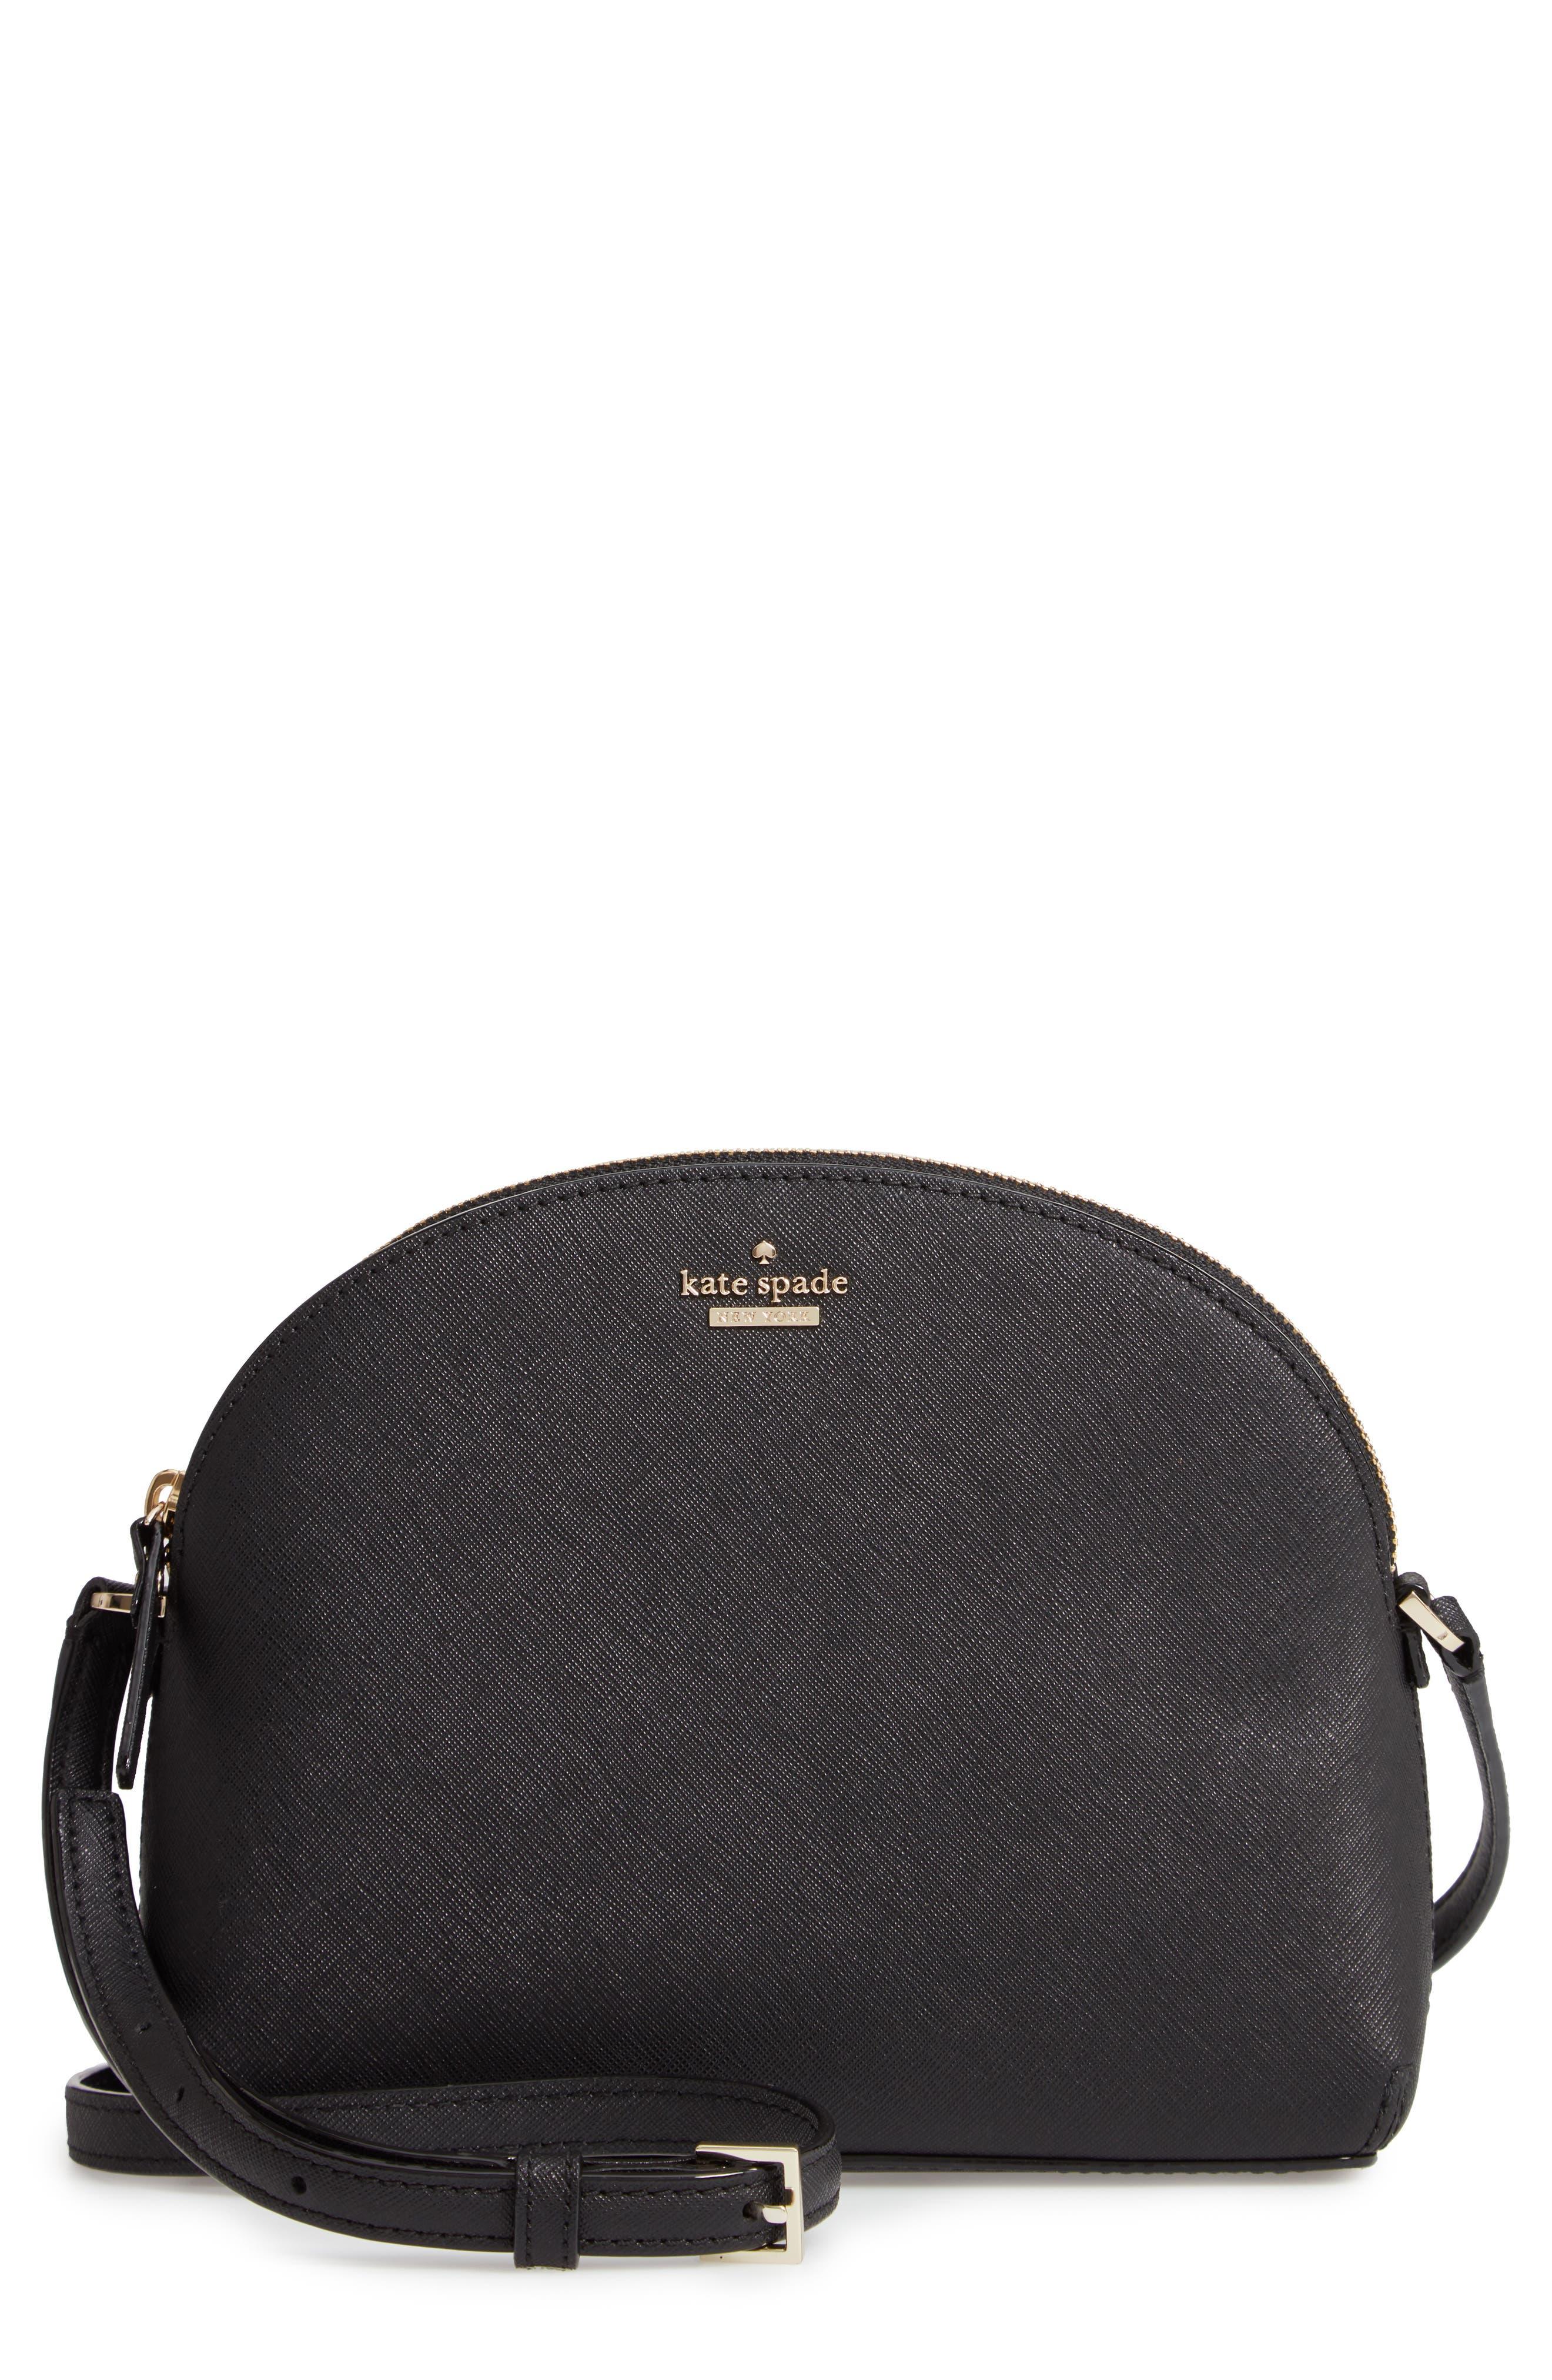 KATE SPADE NEW YORK cameron street large hilli leather crossbody bag, Main, color, 001